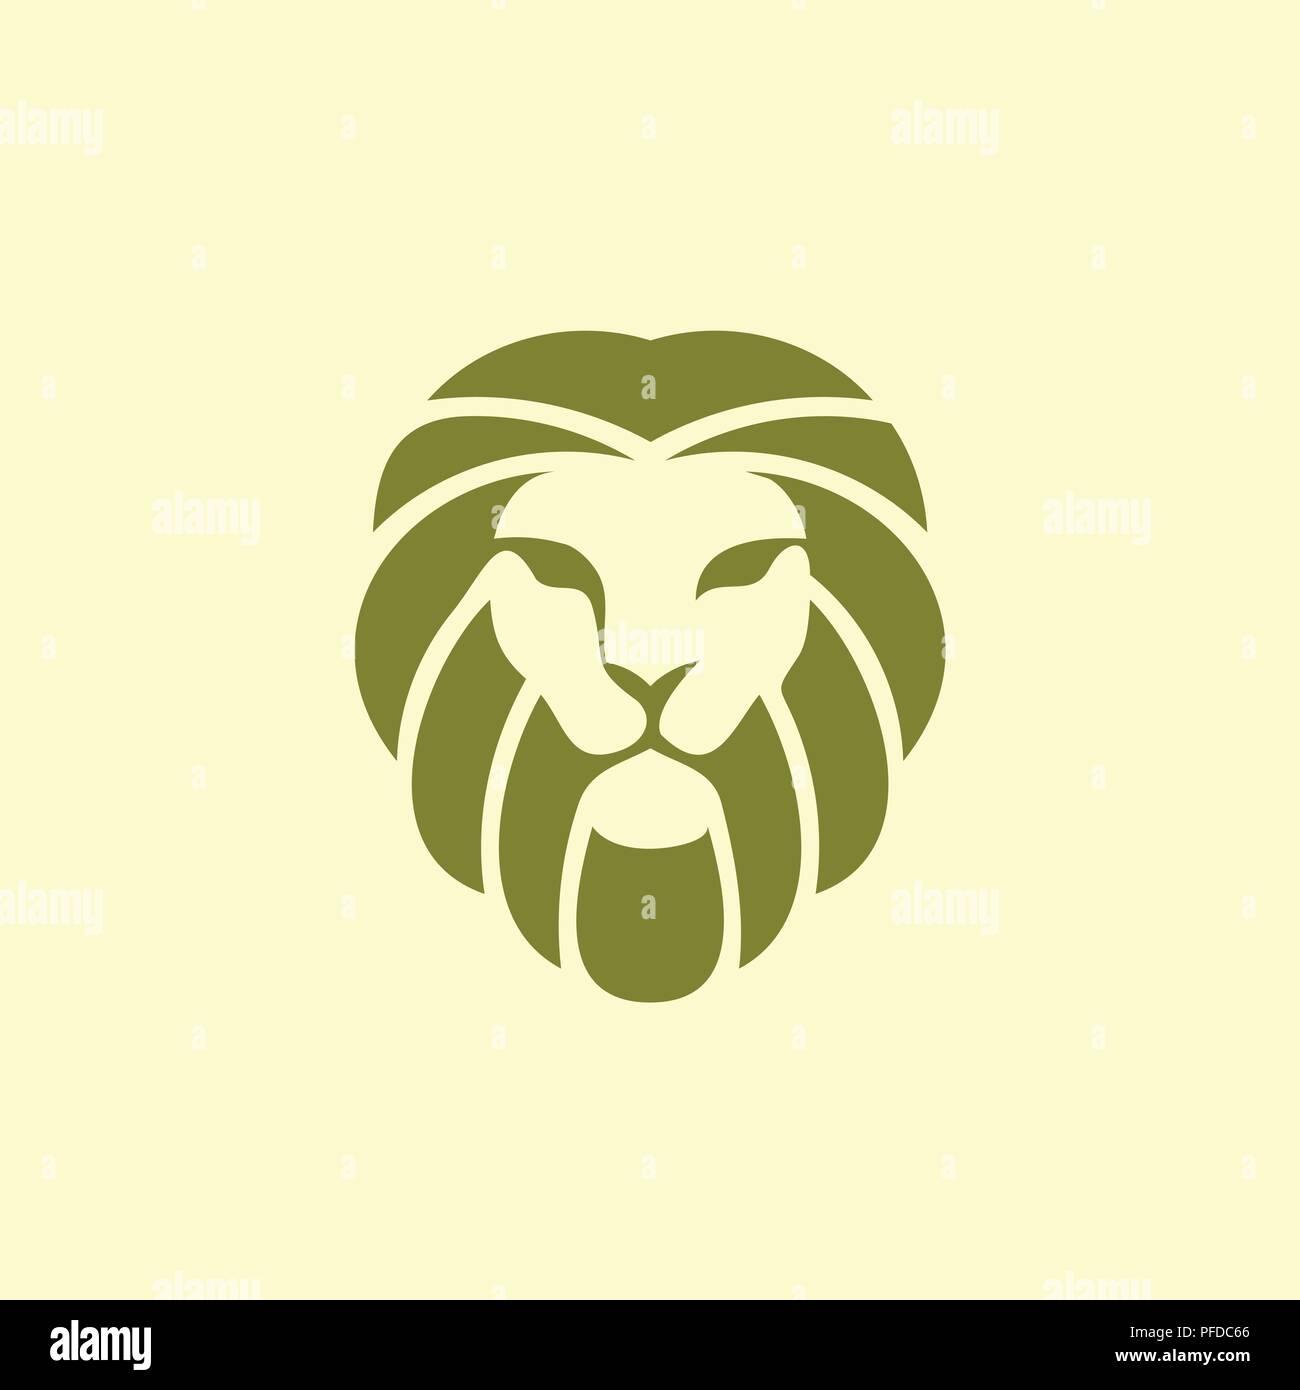 creative simple flat emblem lion king logo vector, Lion logo design